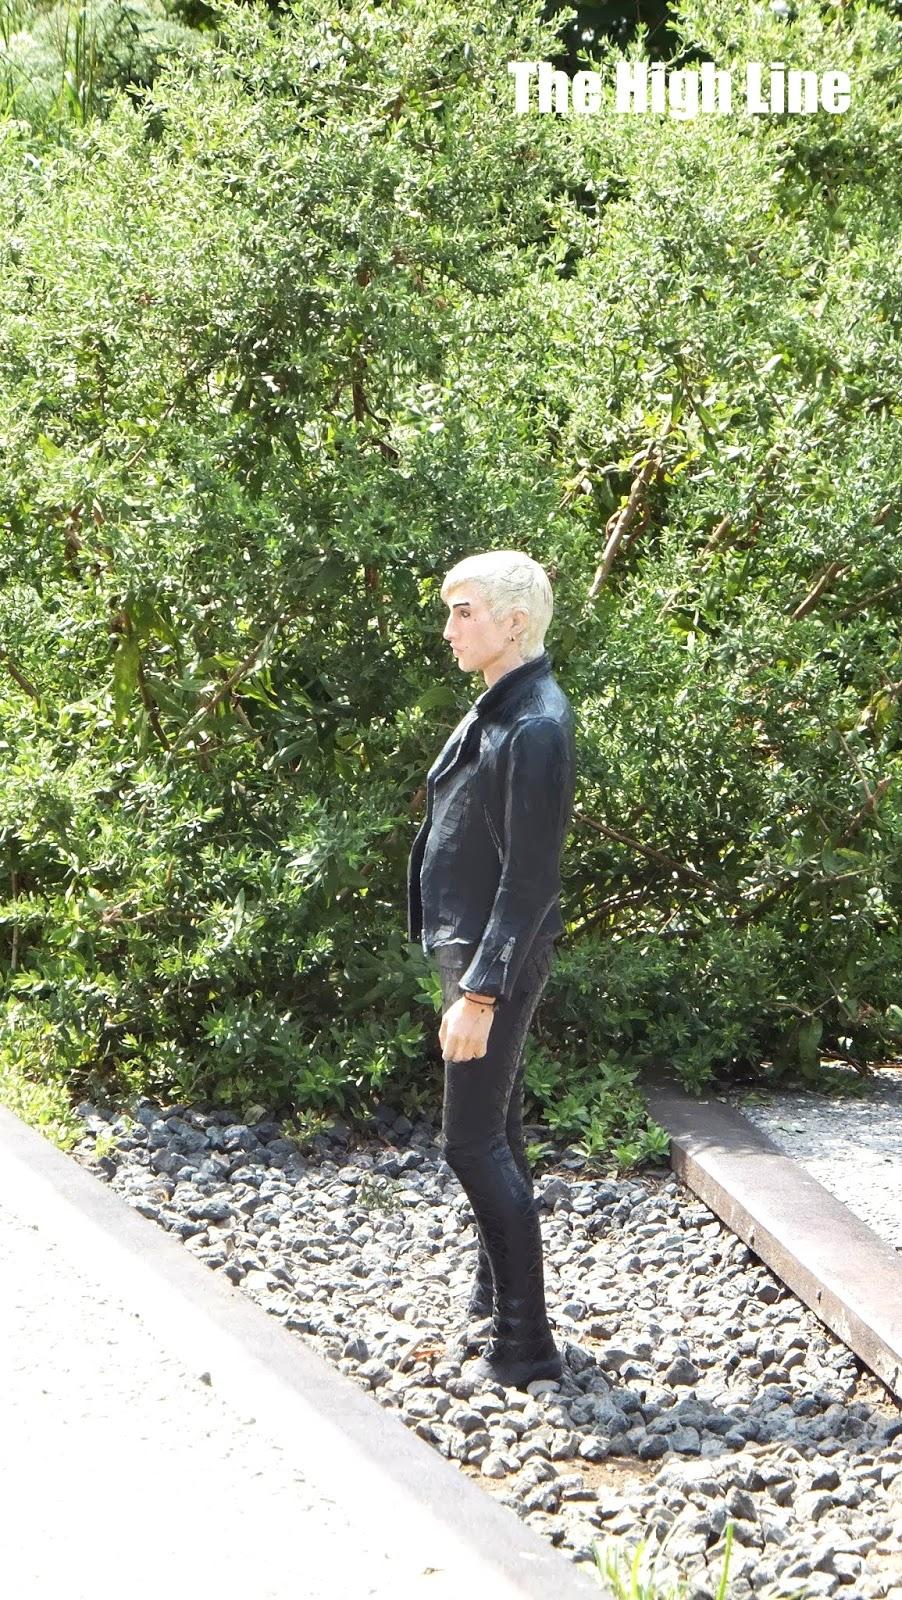 Carson, The High Line Art